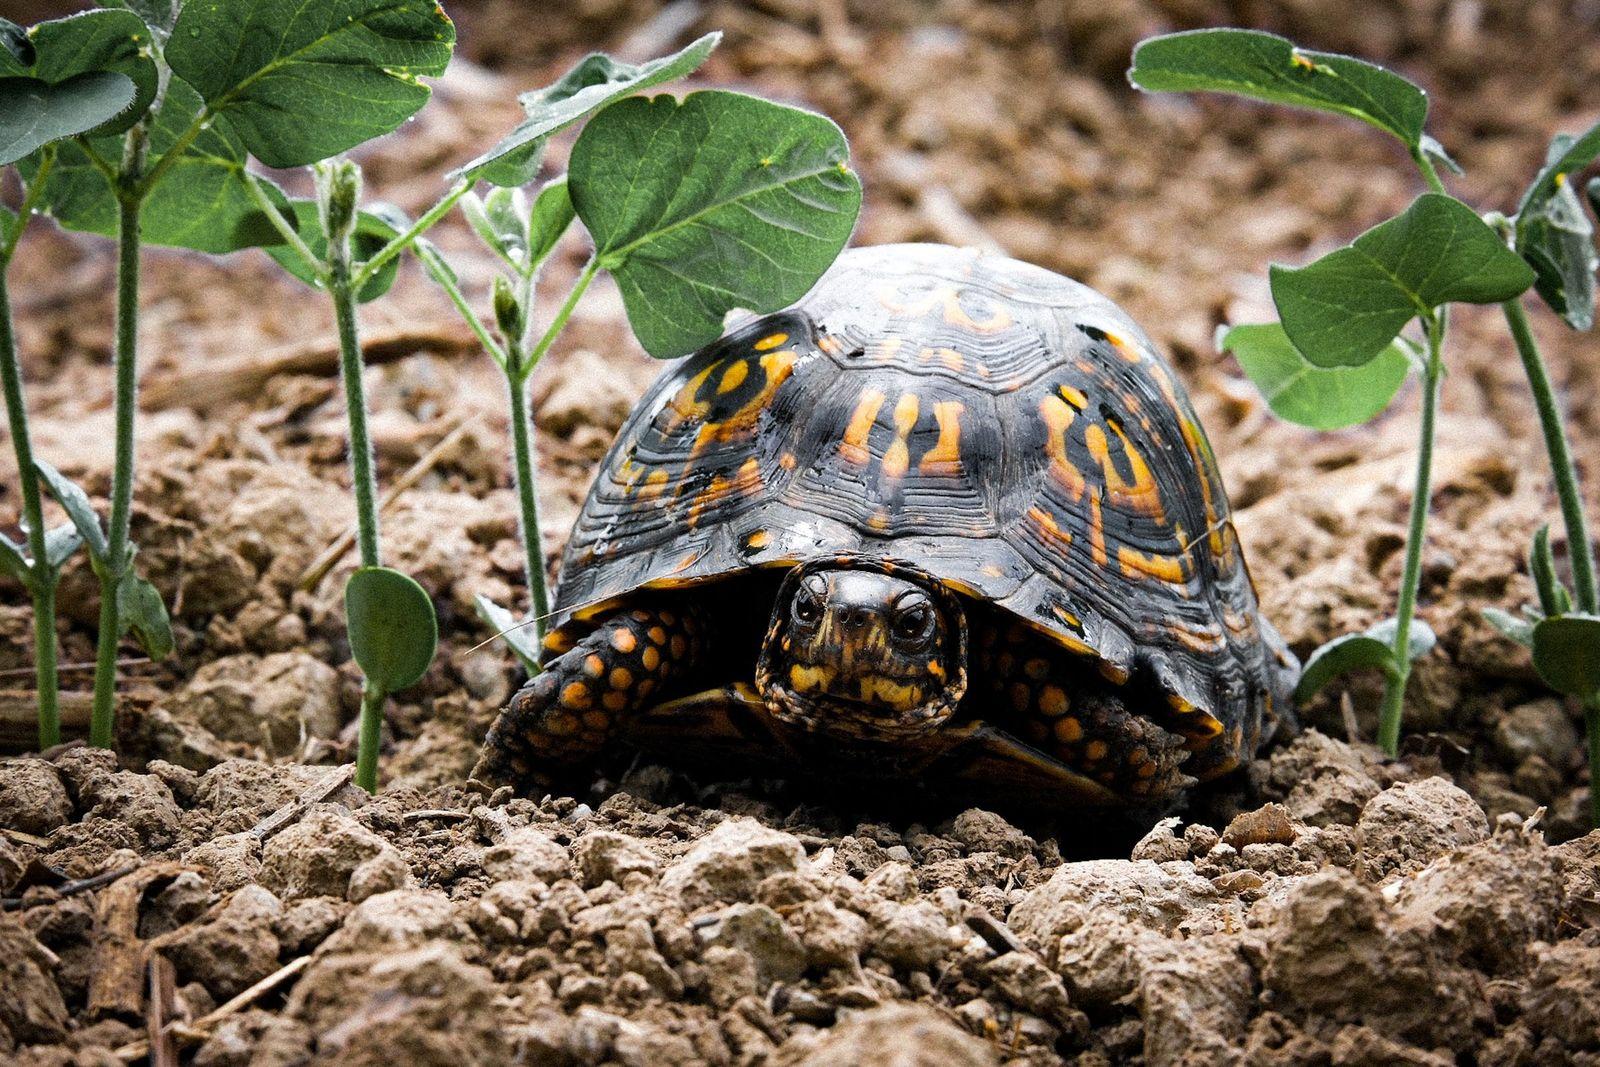 Ulcerative shell disease in turtles - Vetster